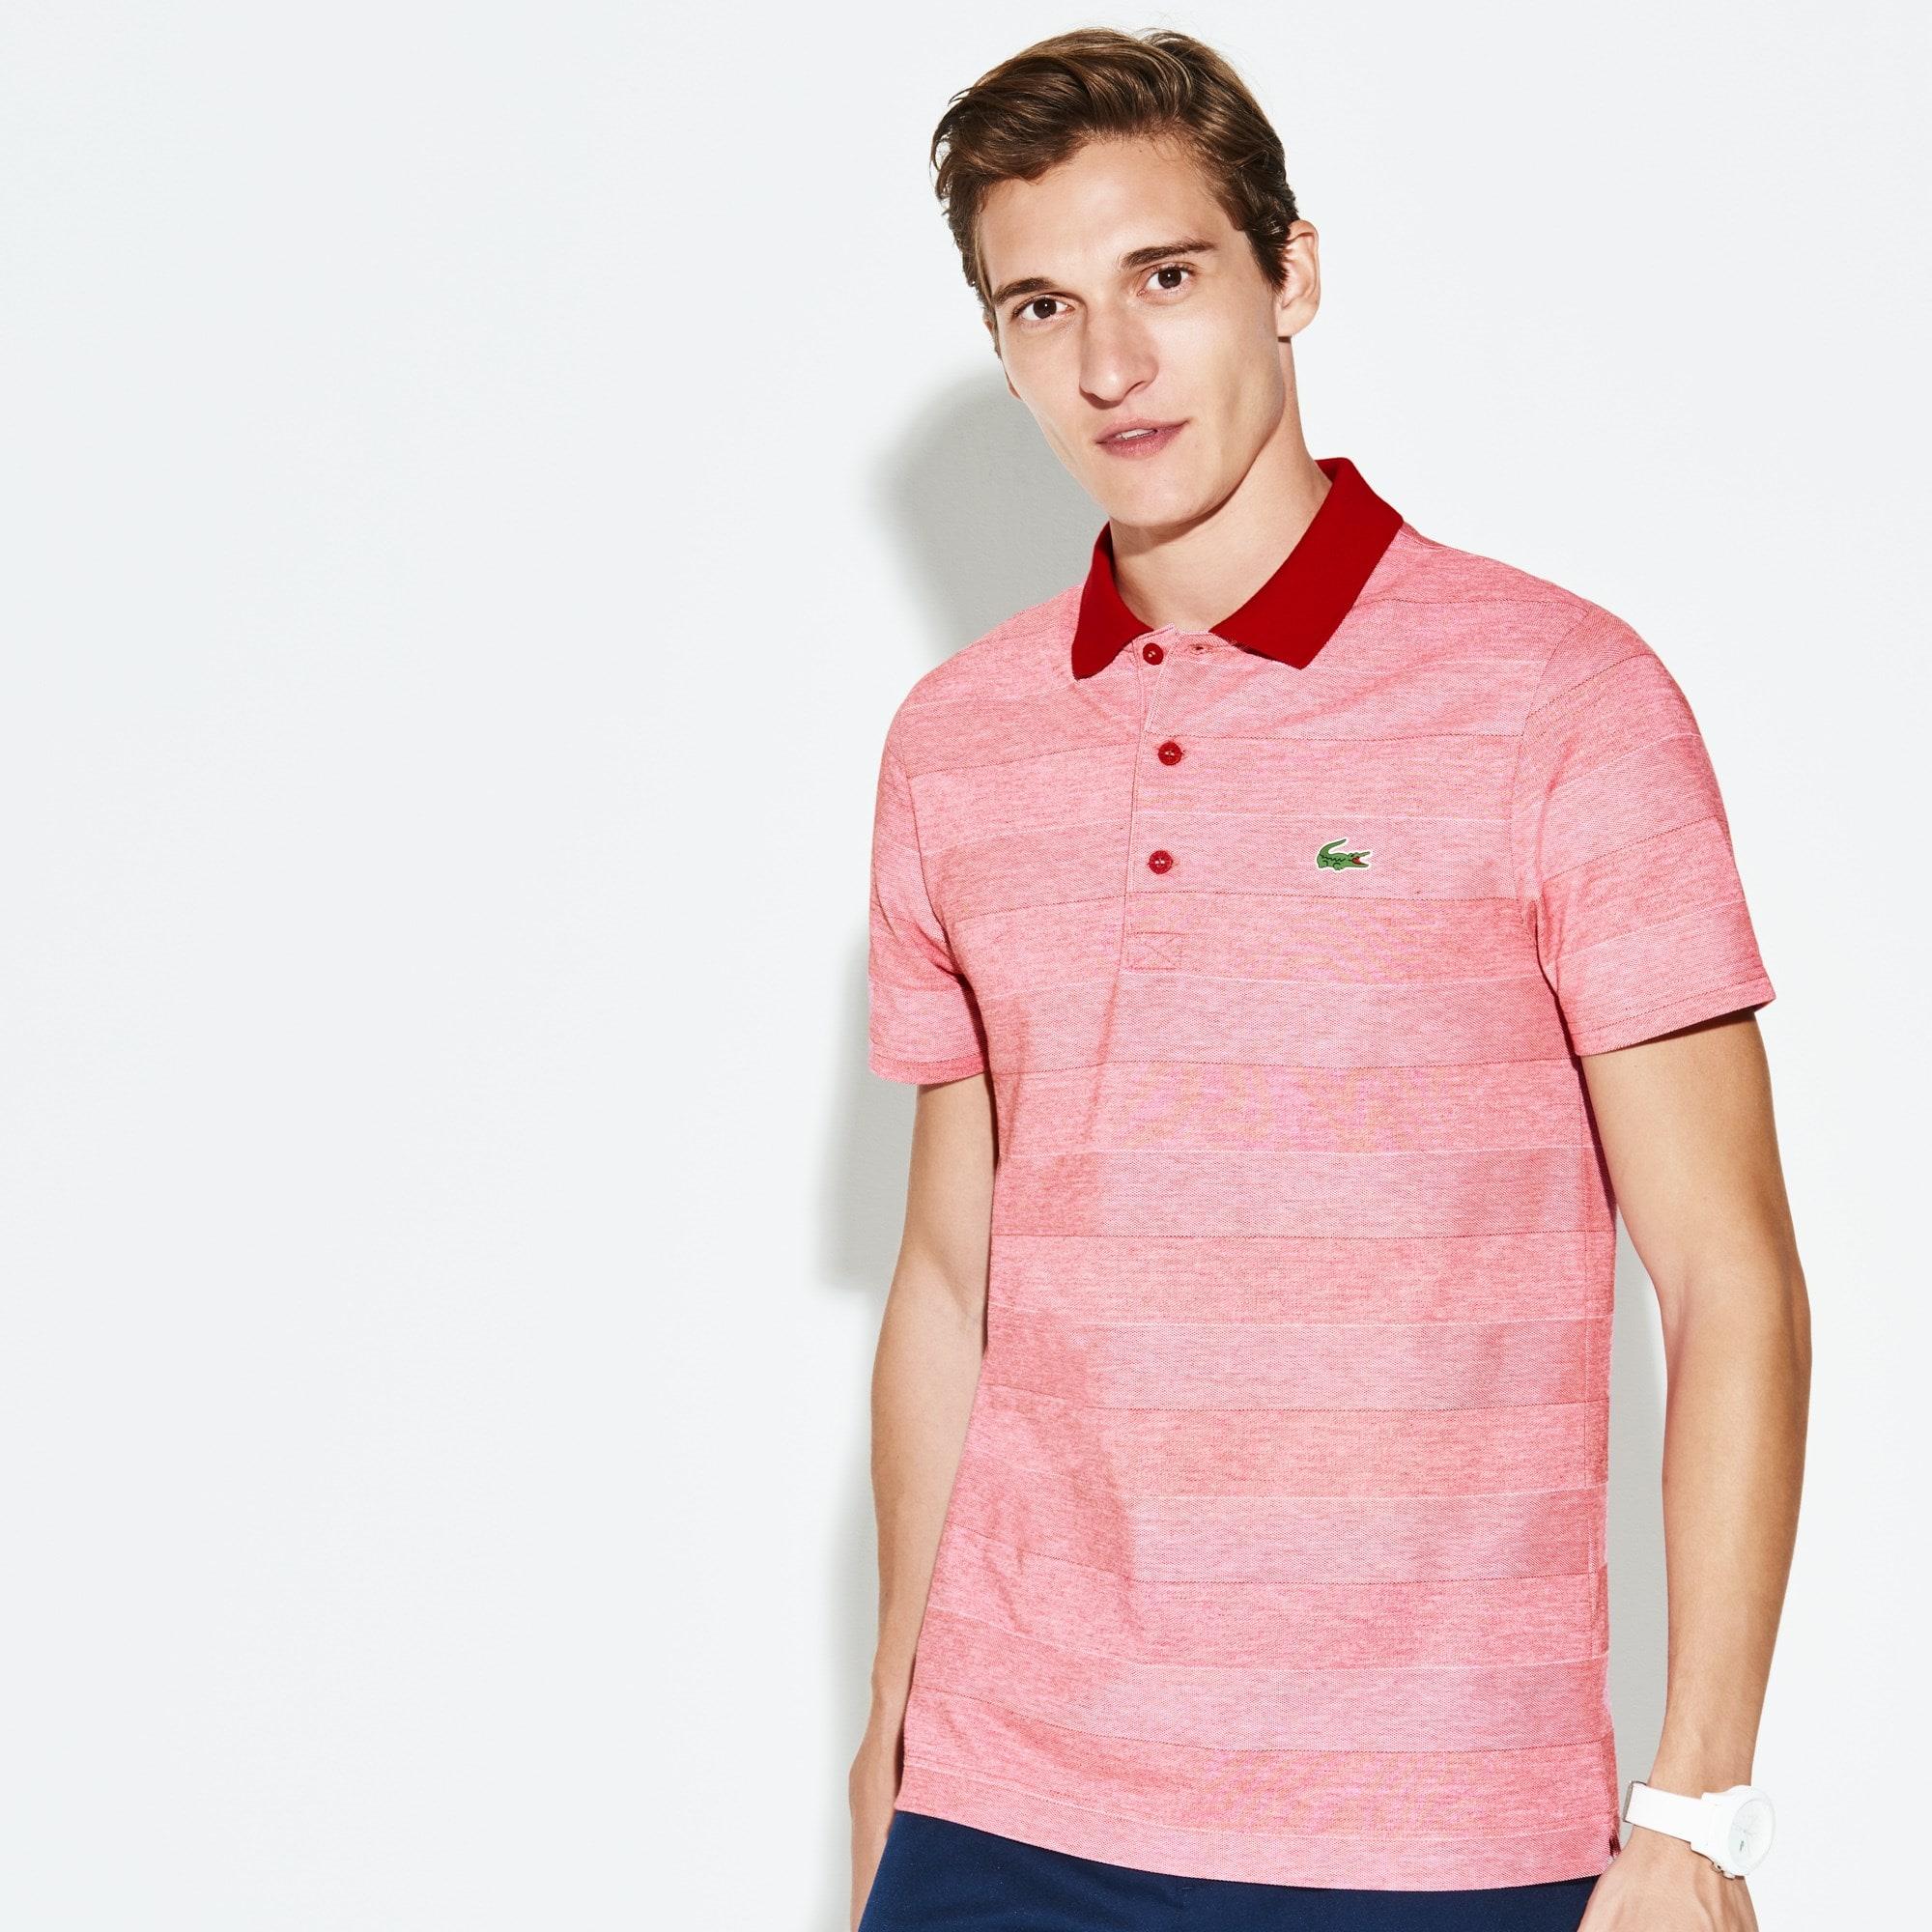 Herren LACOSTE SPORT Golf-Poloshirt aus Funktionsjersey